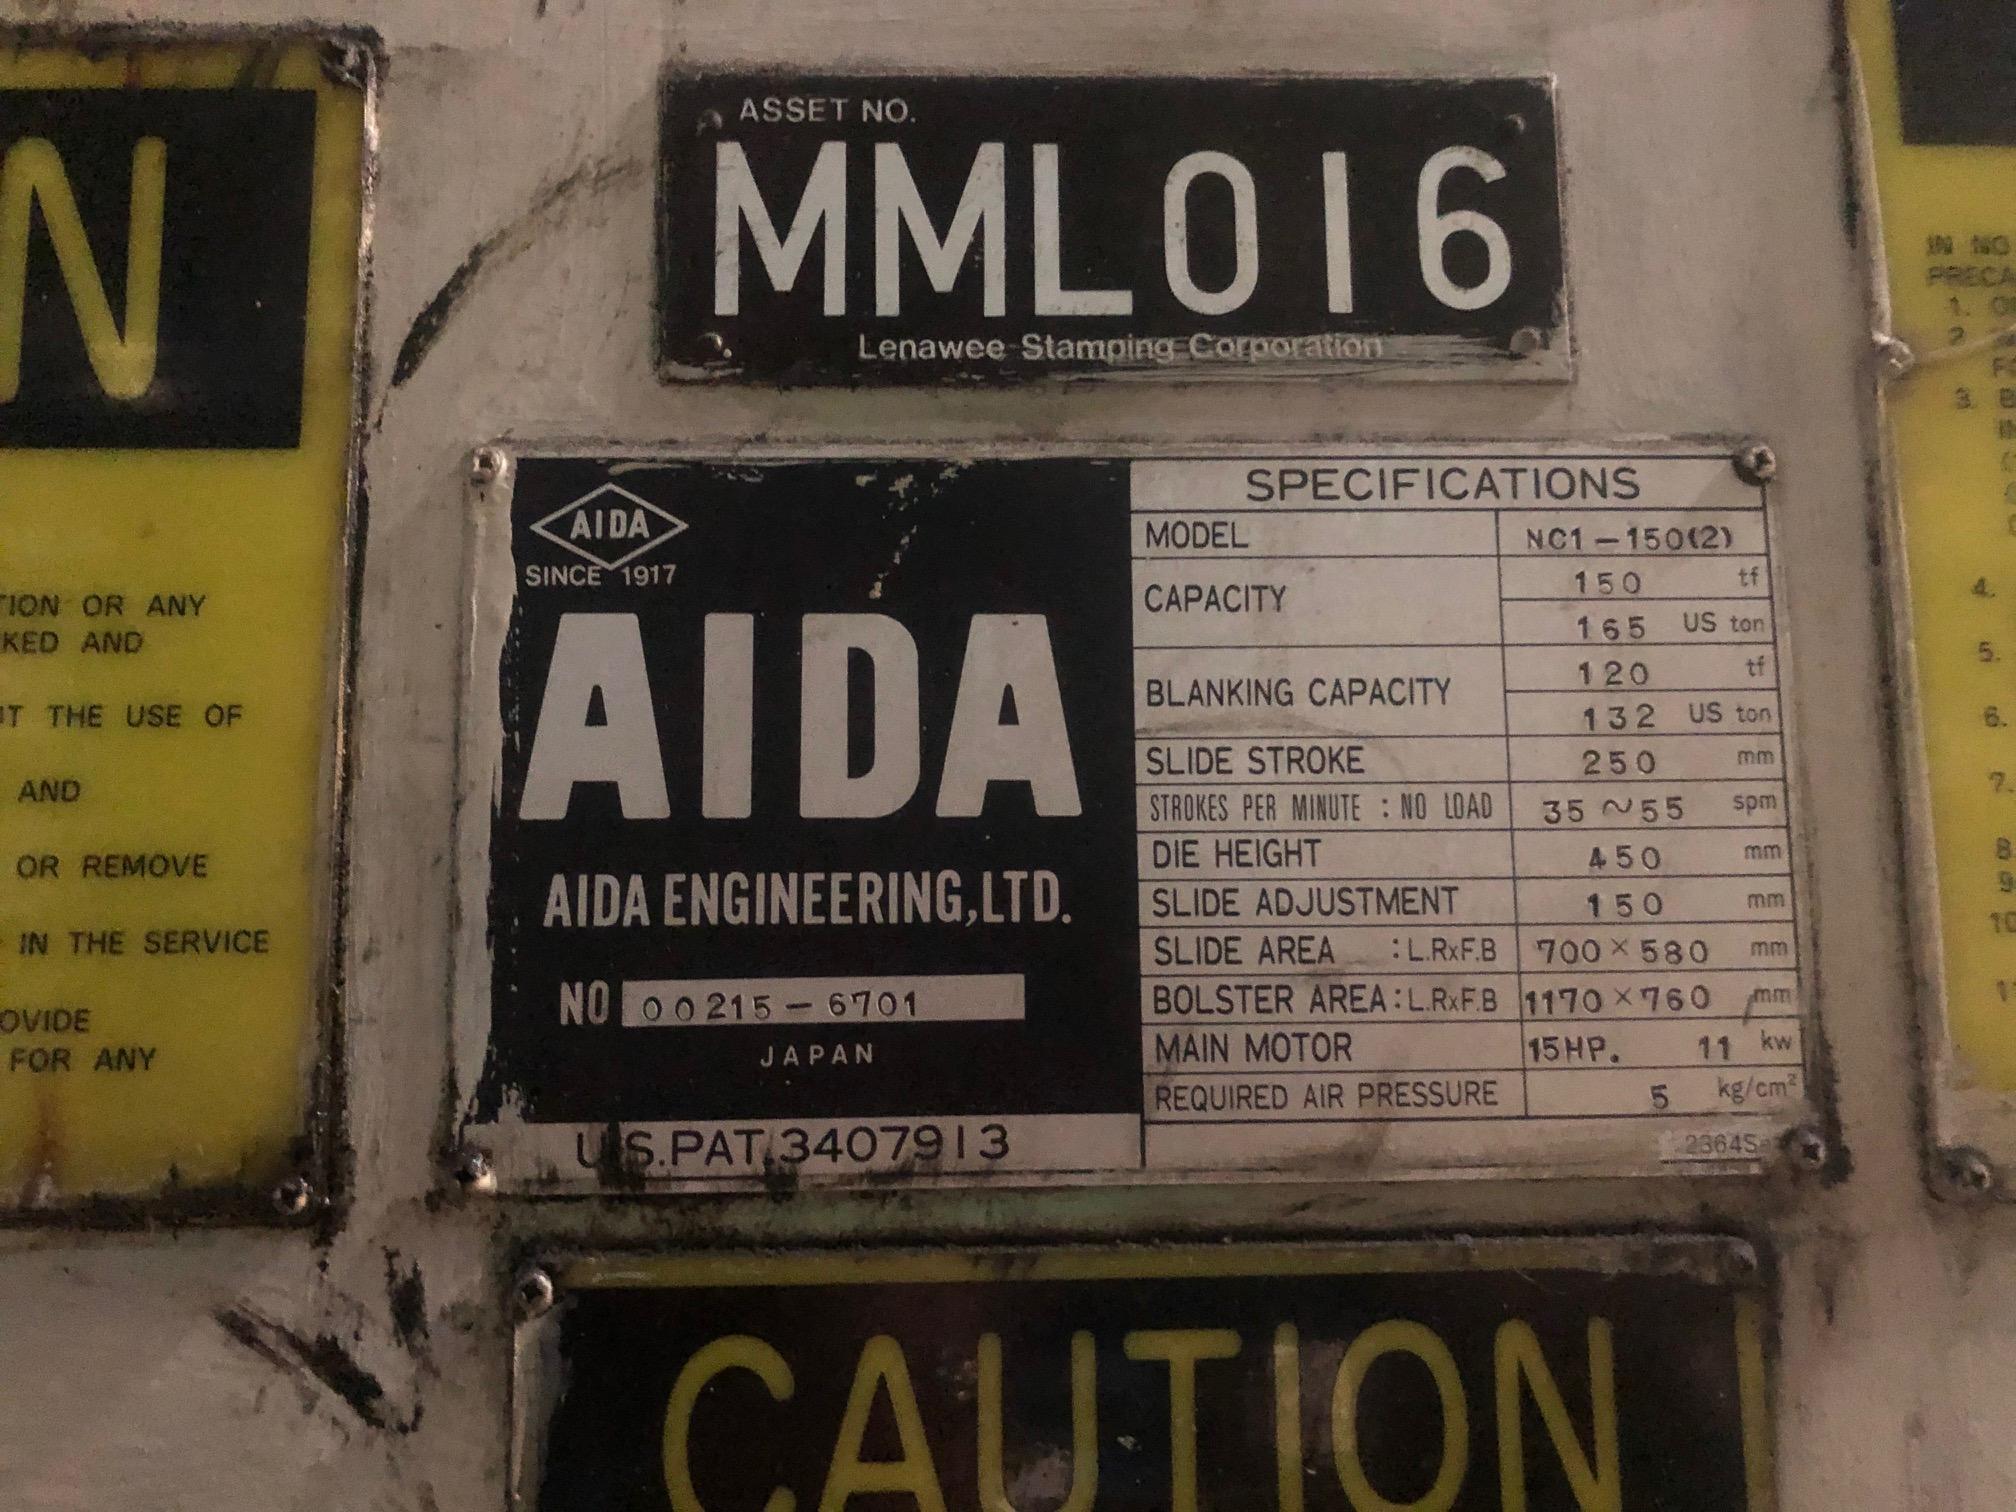 Aida NC1-150(2) data